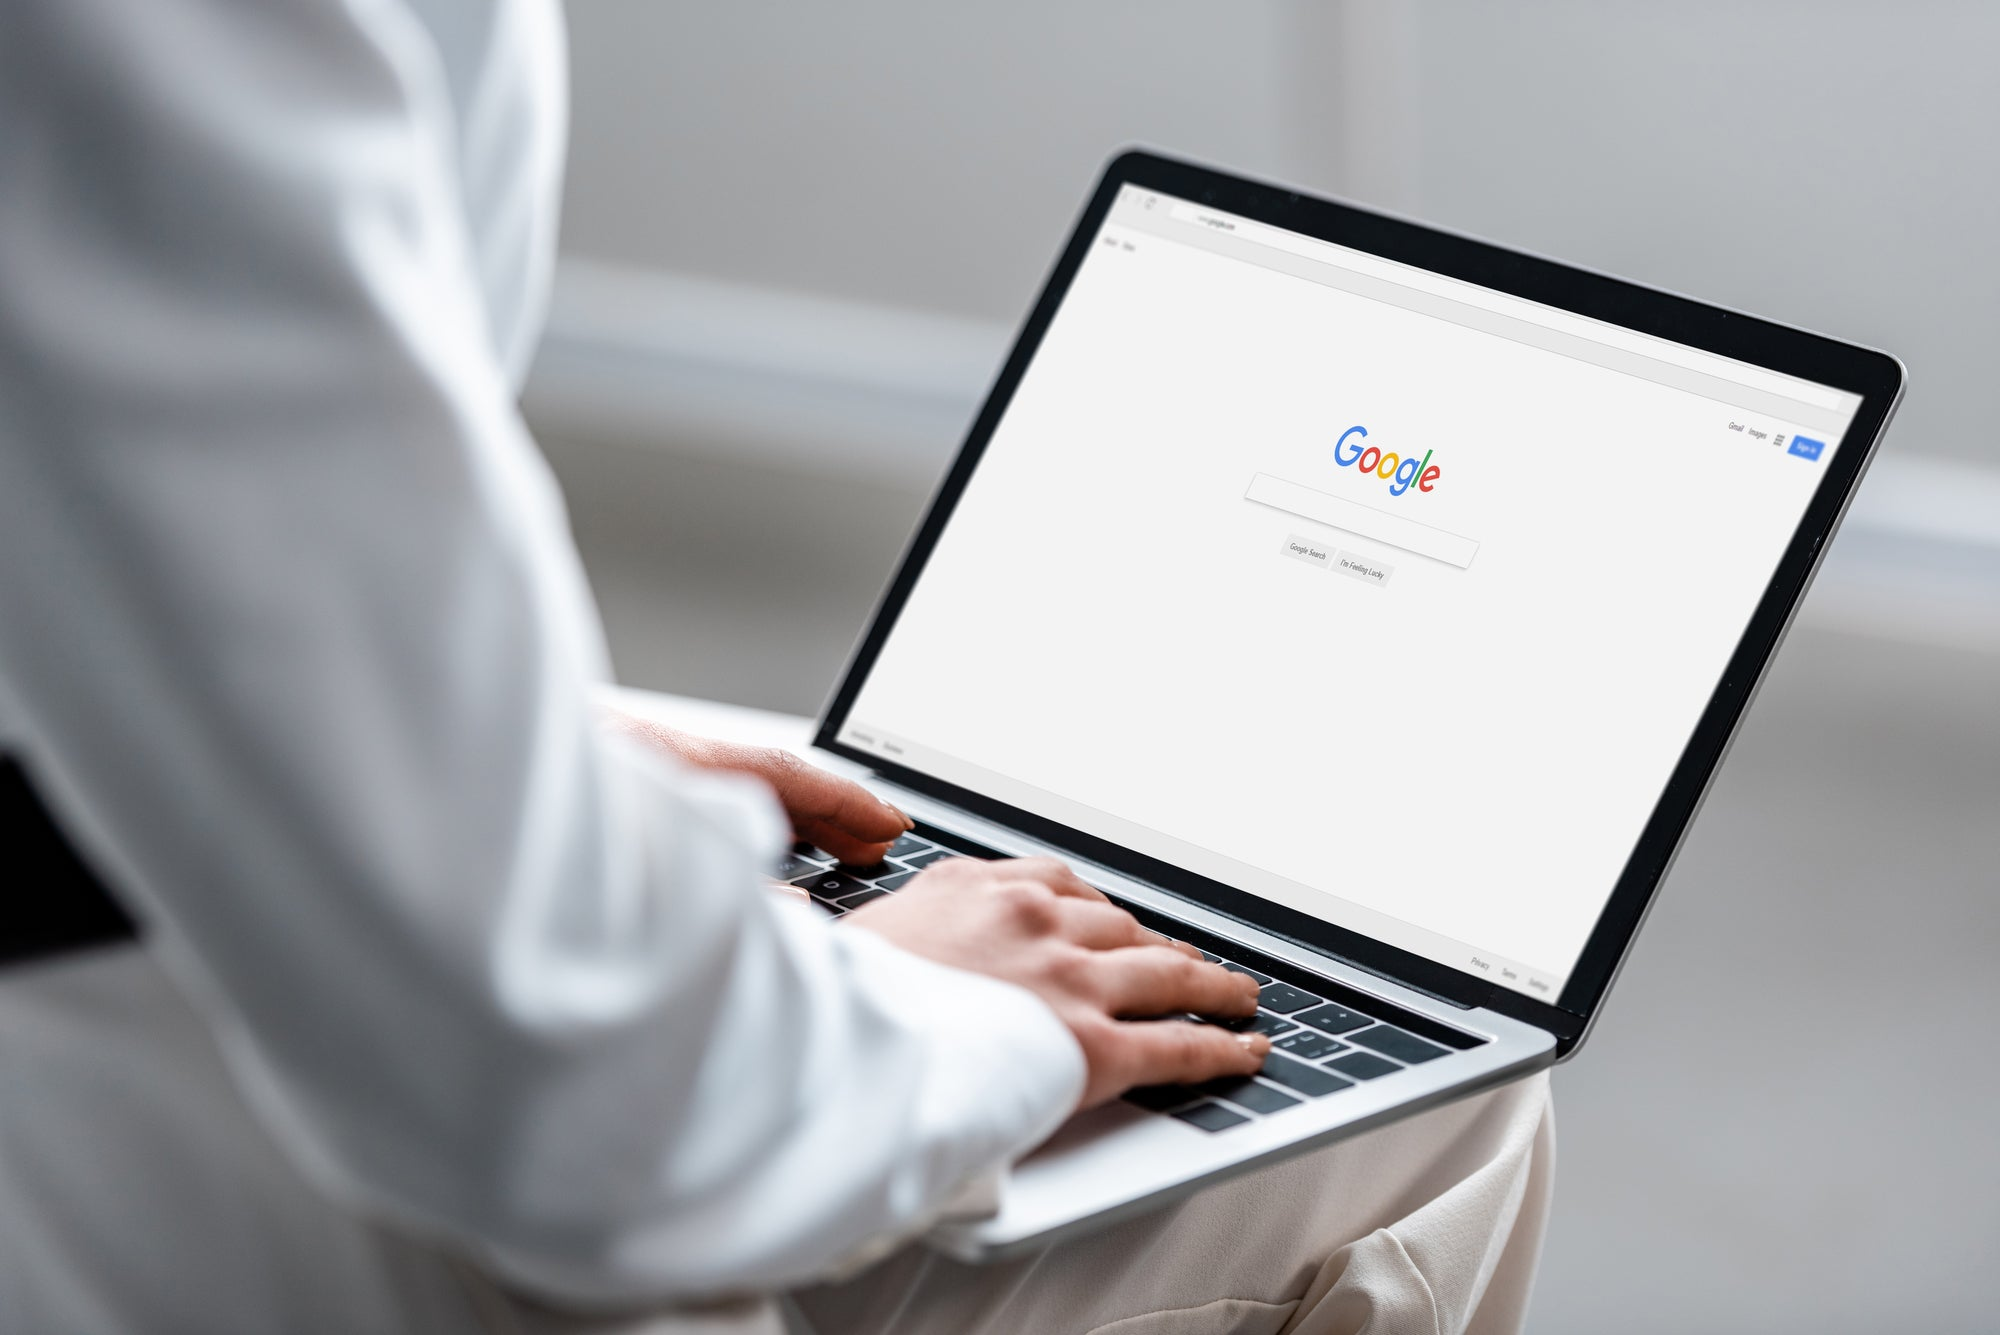 Person googling on laptop